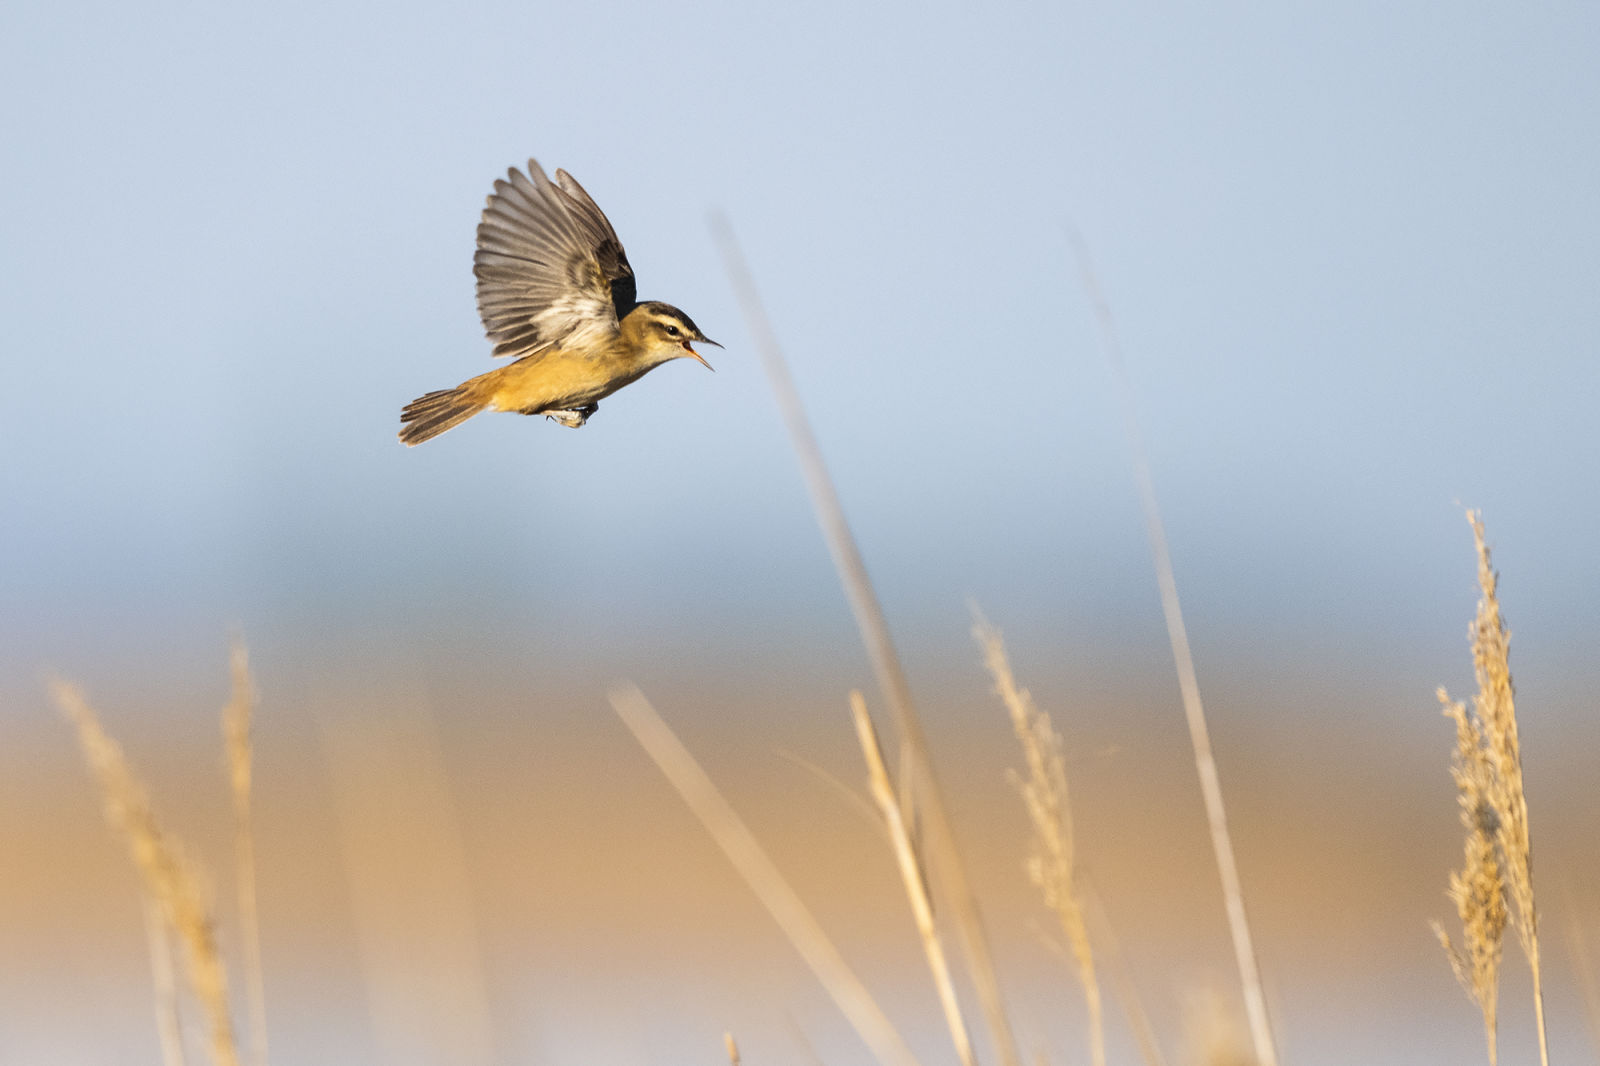 #gobirdingvlogs by Leander Khil - #gobirdingvlog Episode 7: Spring Bird Sounds Schilfrohrsänger by Leander Khil